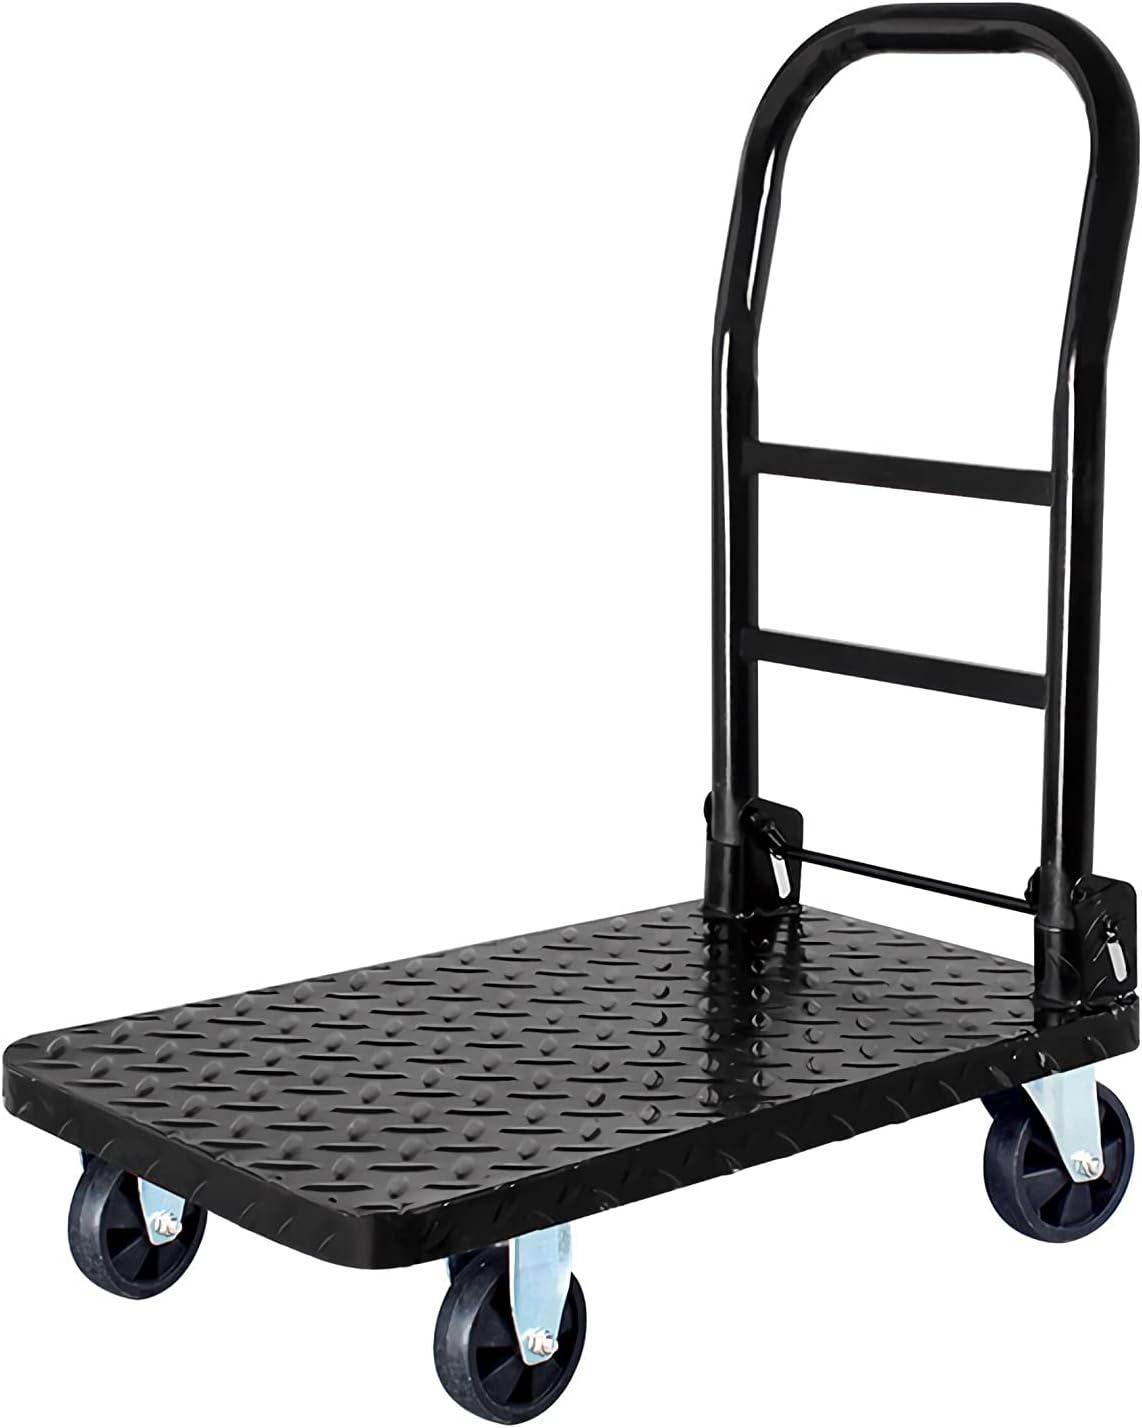 DALIZHAI777 Platform Popularity Cart Push Deck Tr Max 66% OFF Steel Dolly